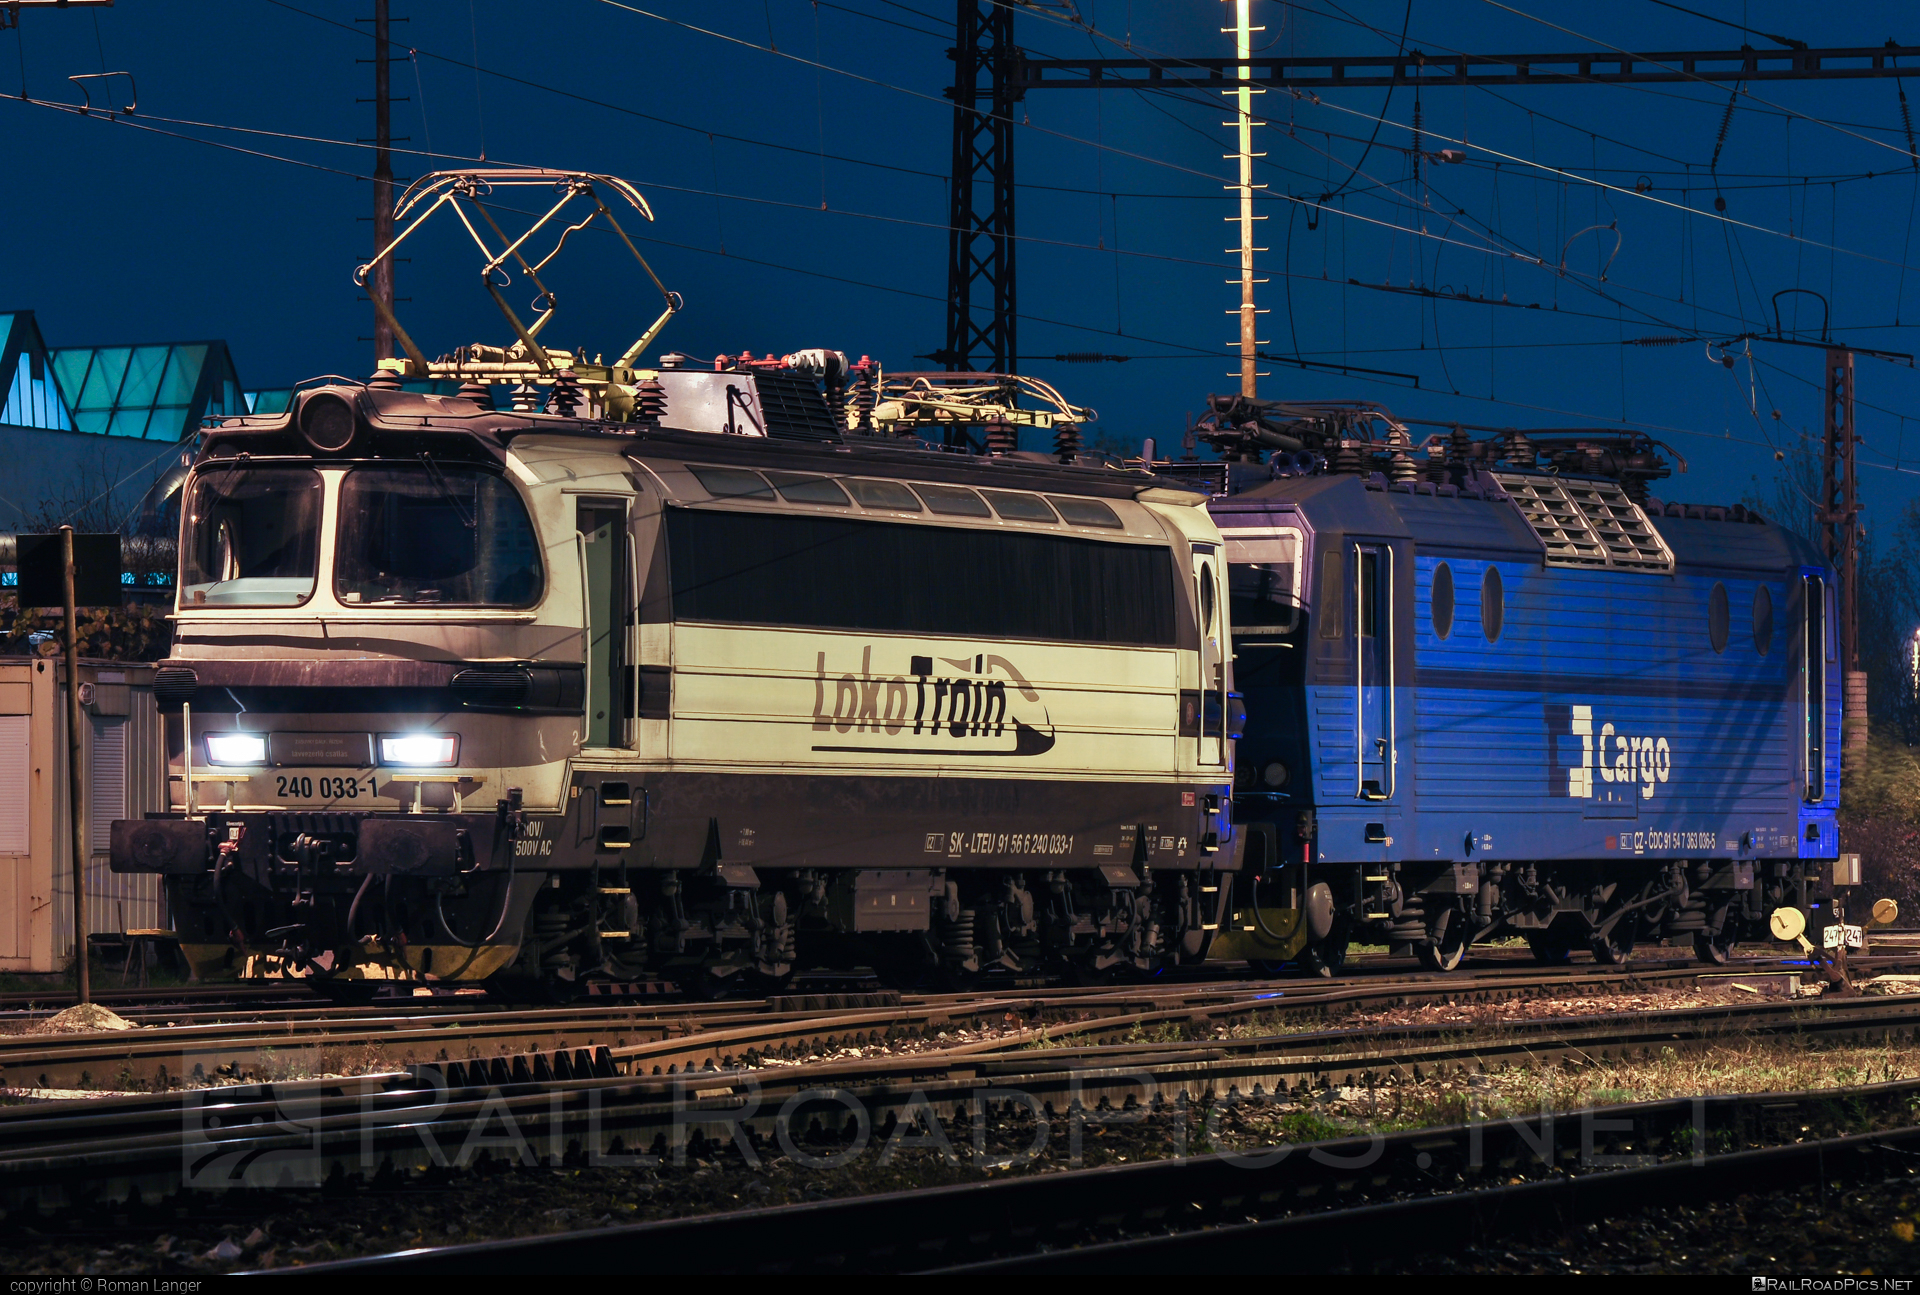 Škoda 47E - 240 033-1 operated by Loko Train s.r.o. #laminatka #locomotive240 #lokotrain #lokotrainsro #skoda #skoda47e